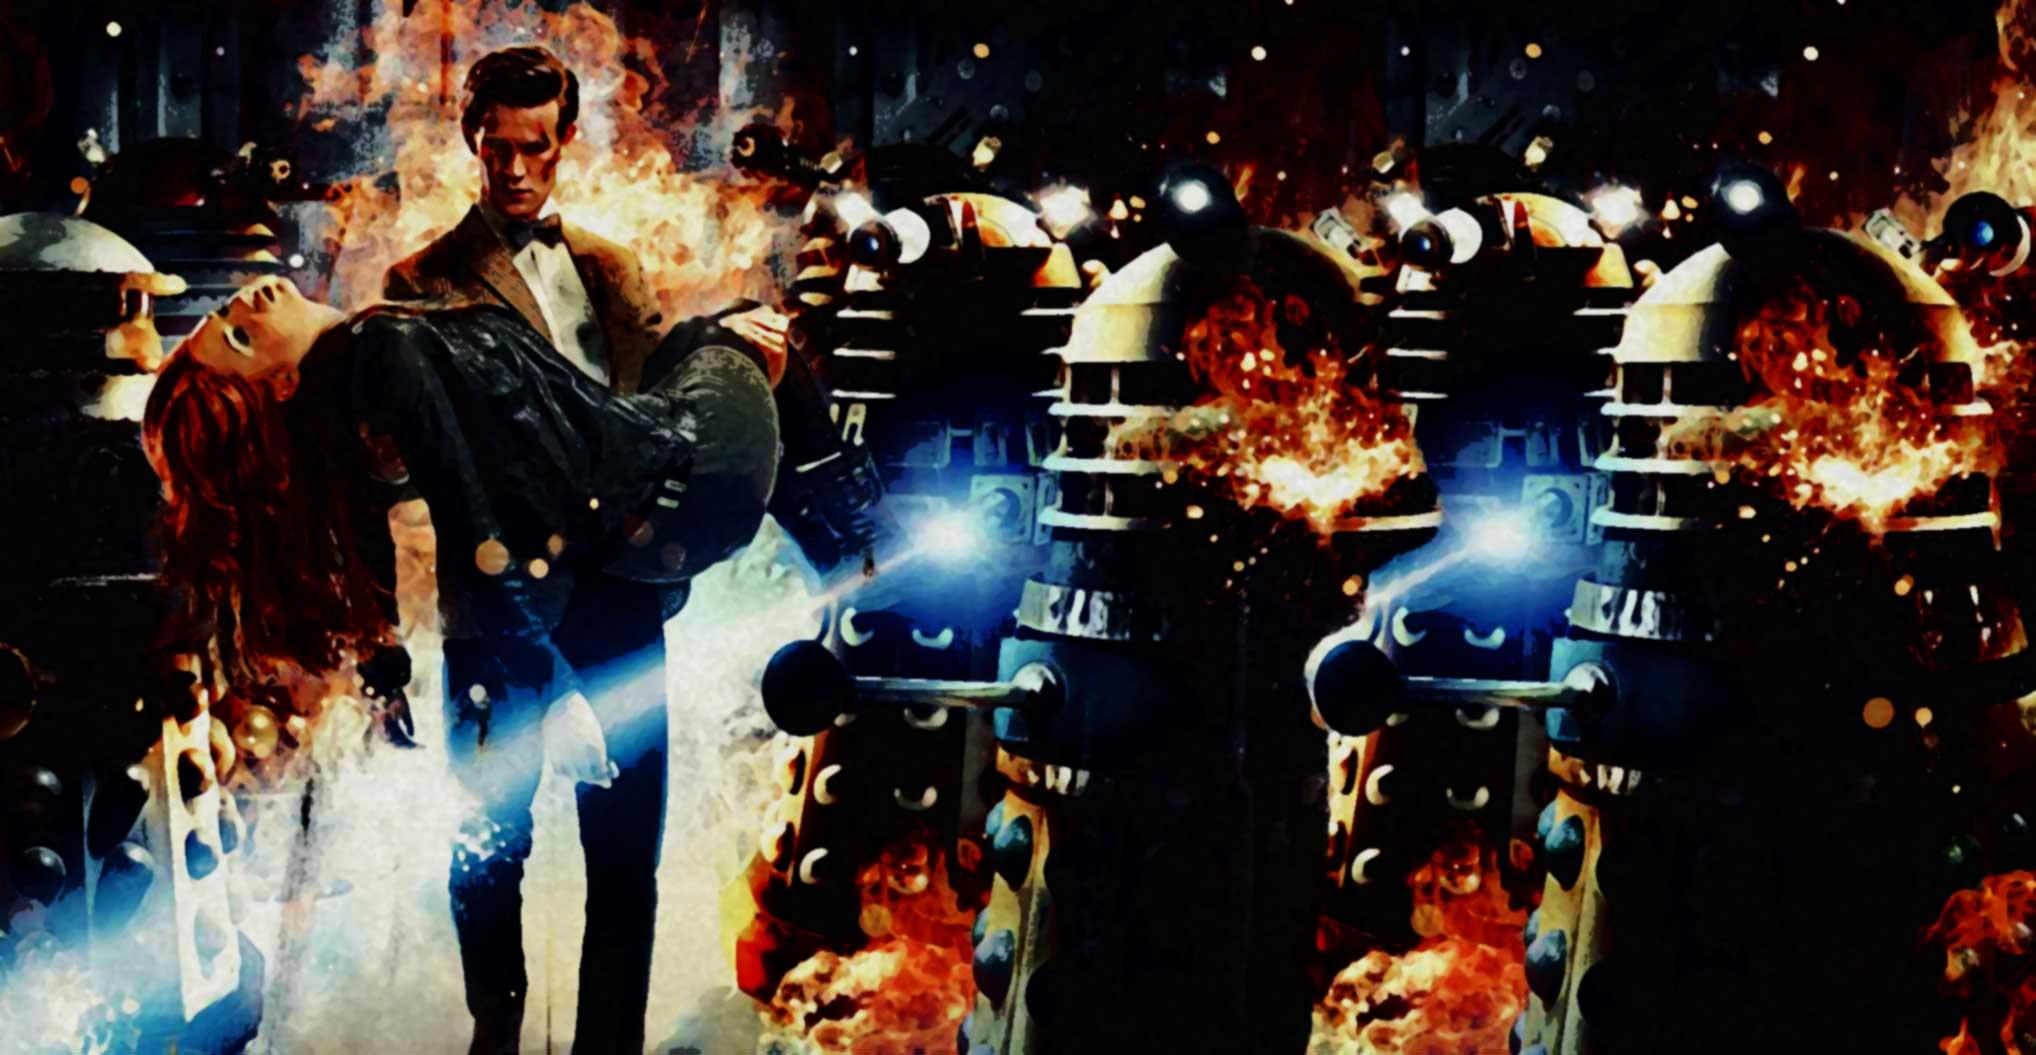 Doctor-Who-Season-7-background1.jpg